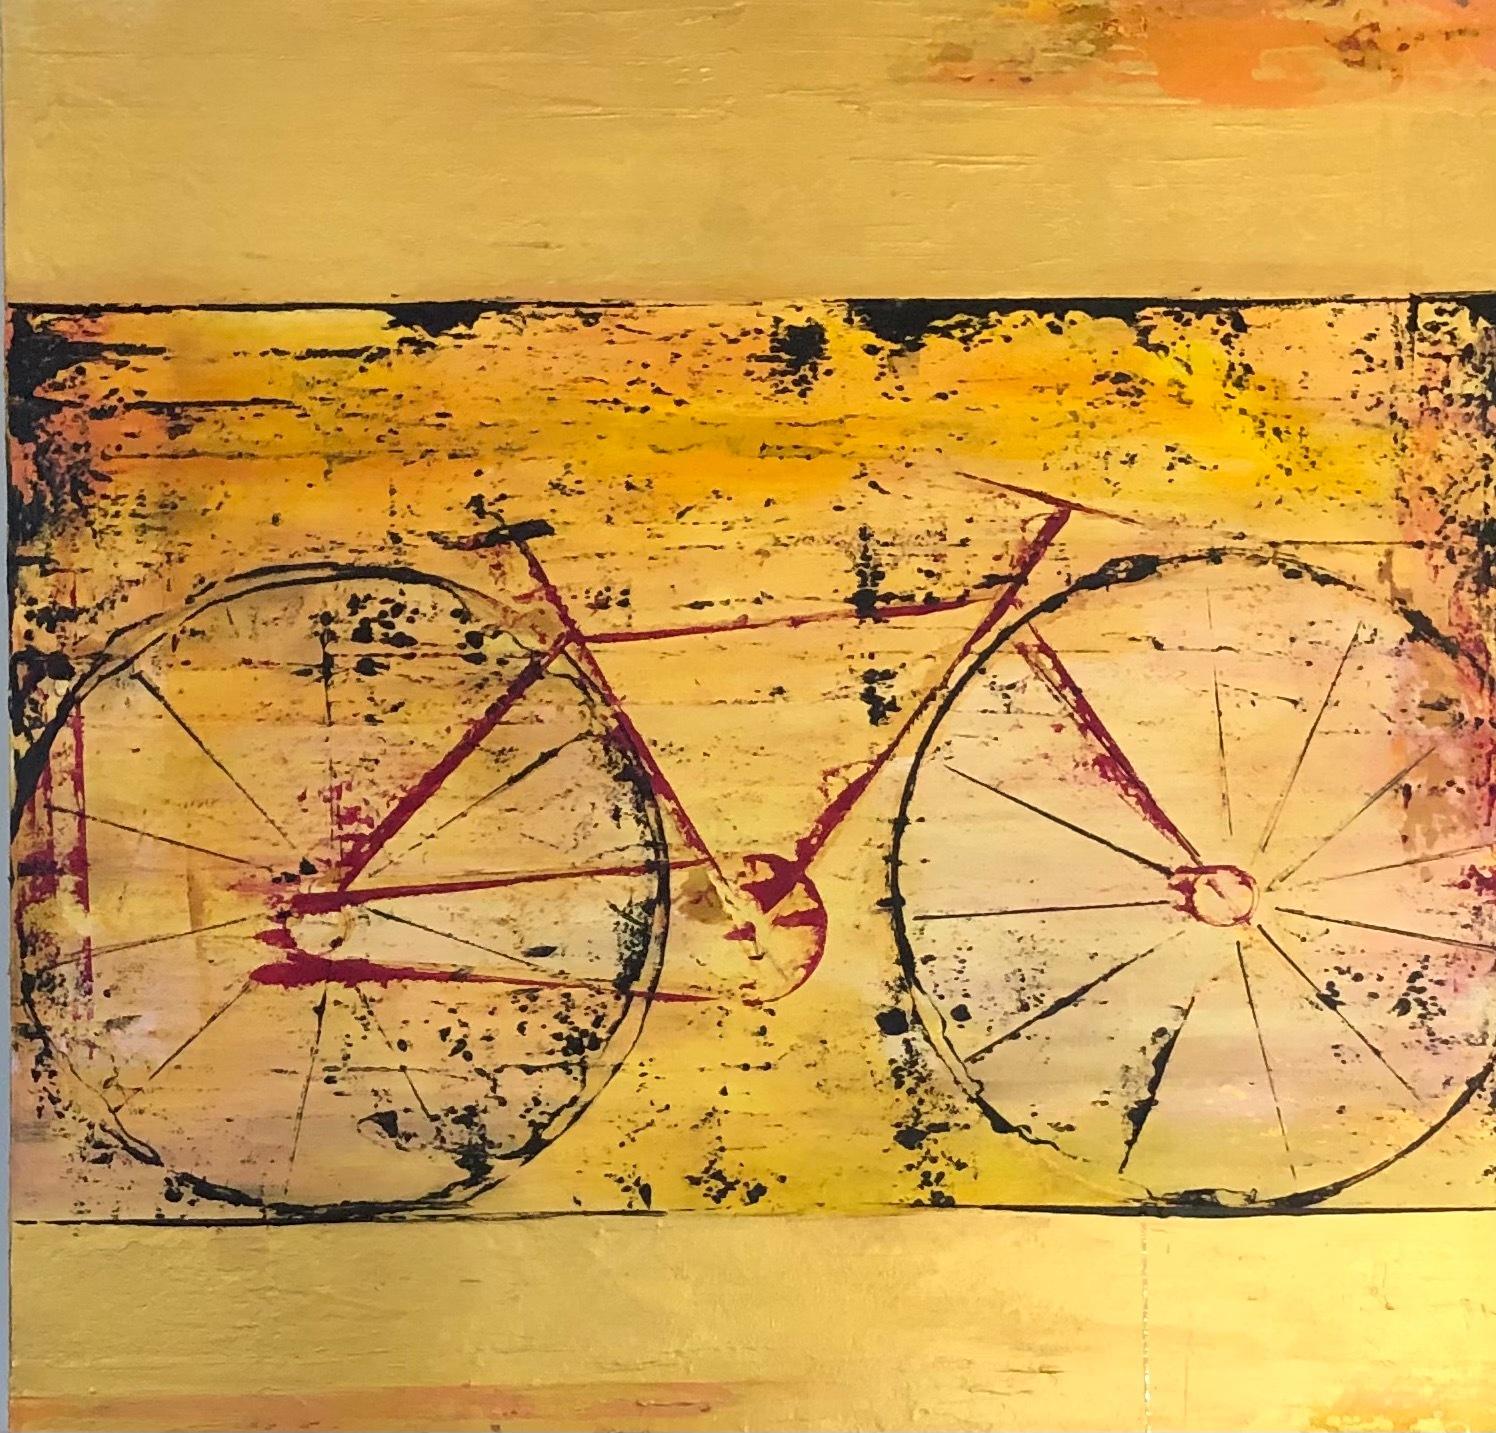 Golden bike lwfjec